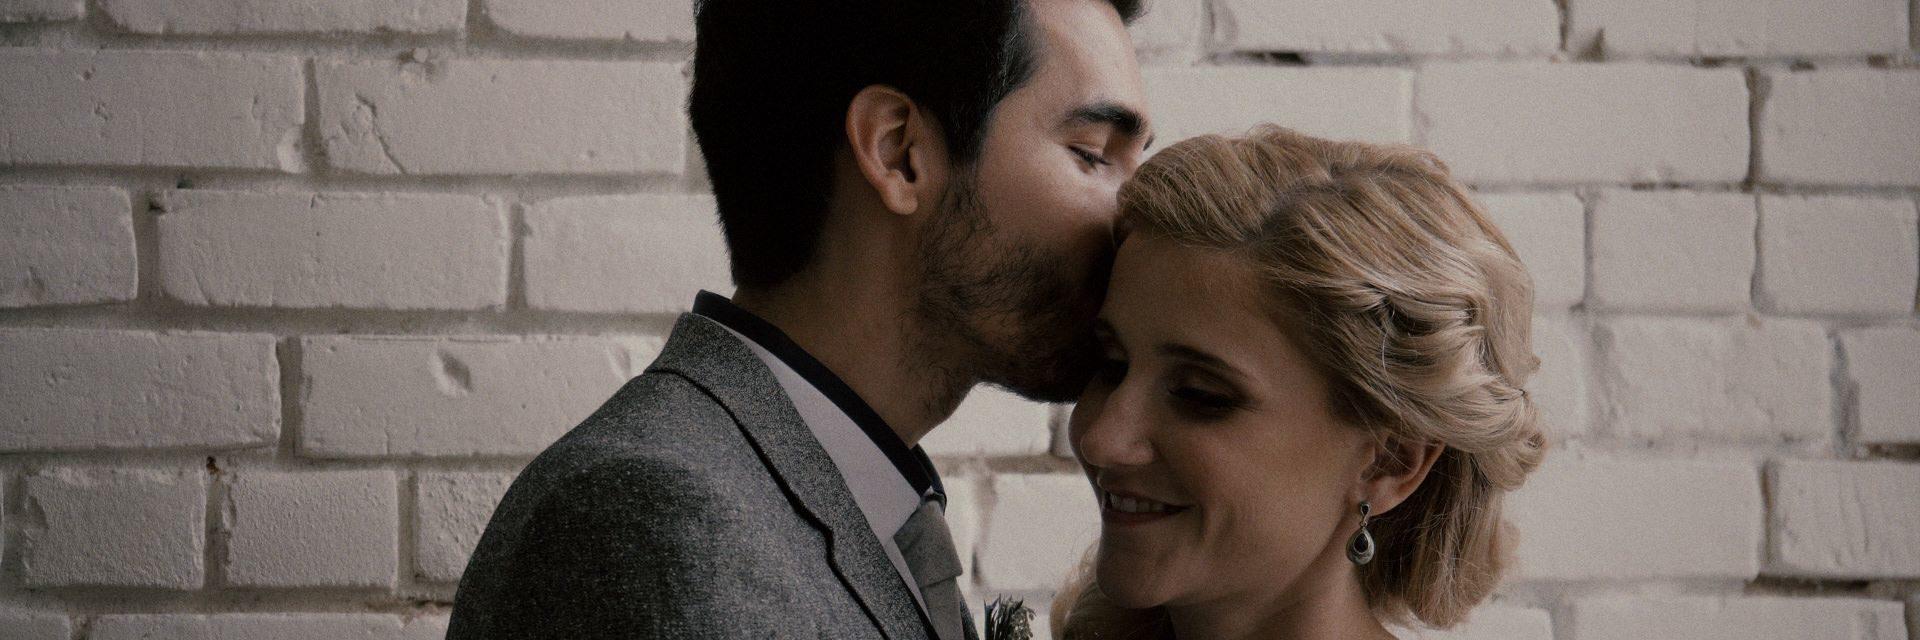 Lausanne-wedding-videographer-cinemate-films-03